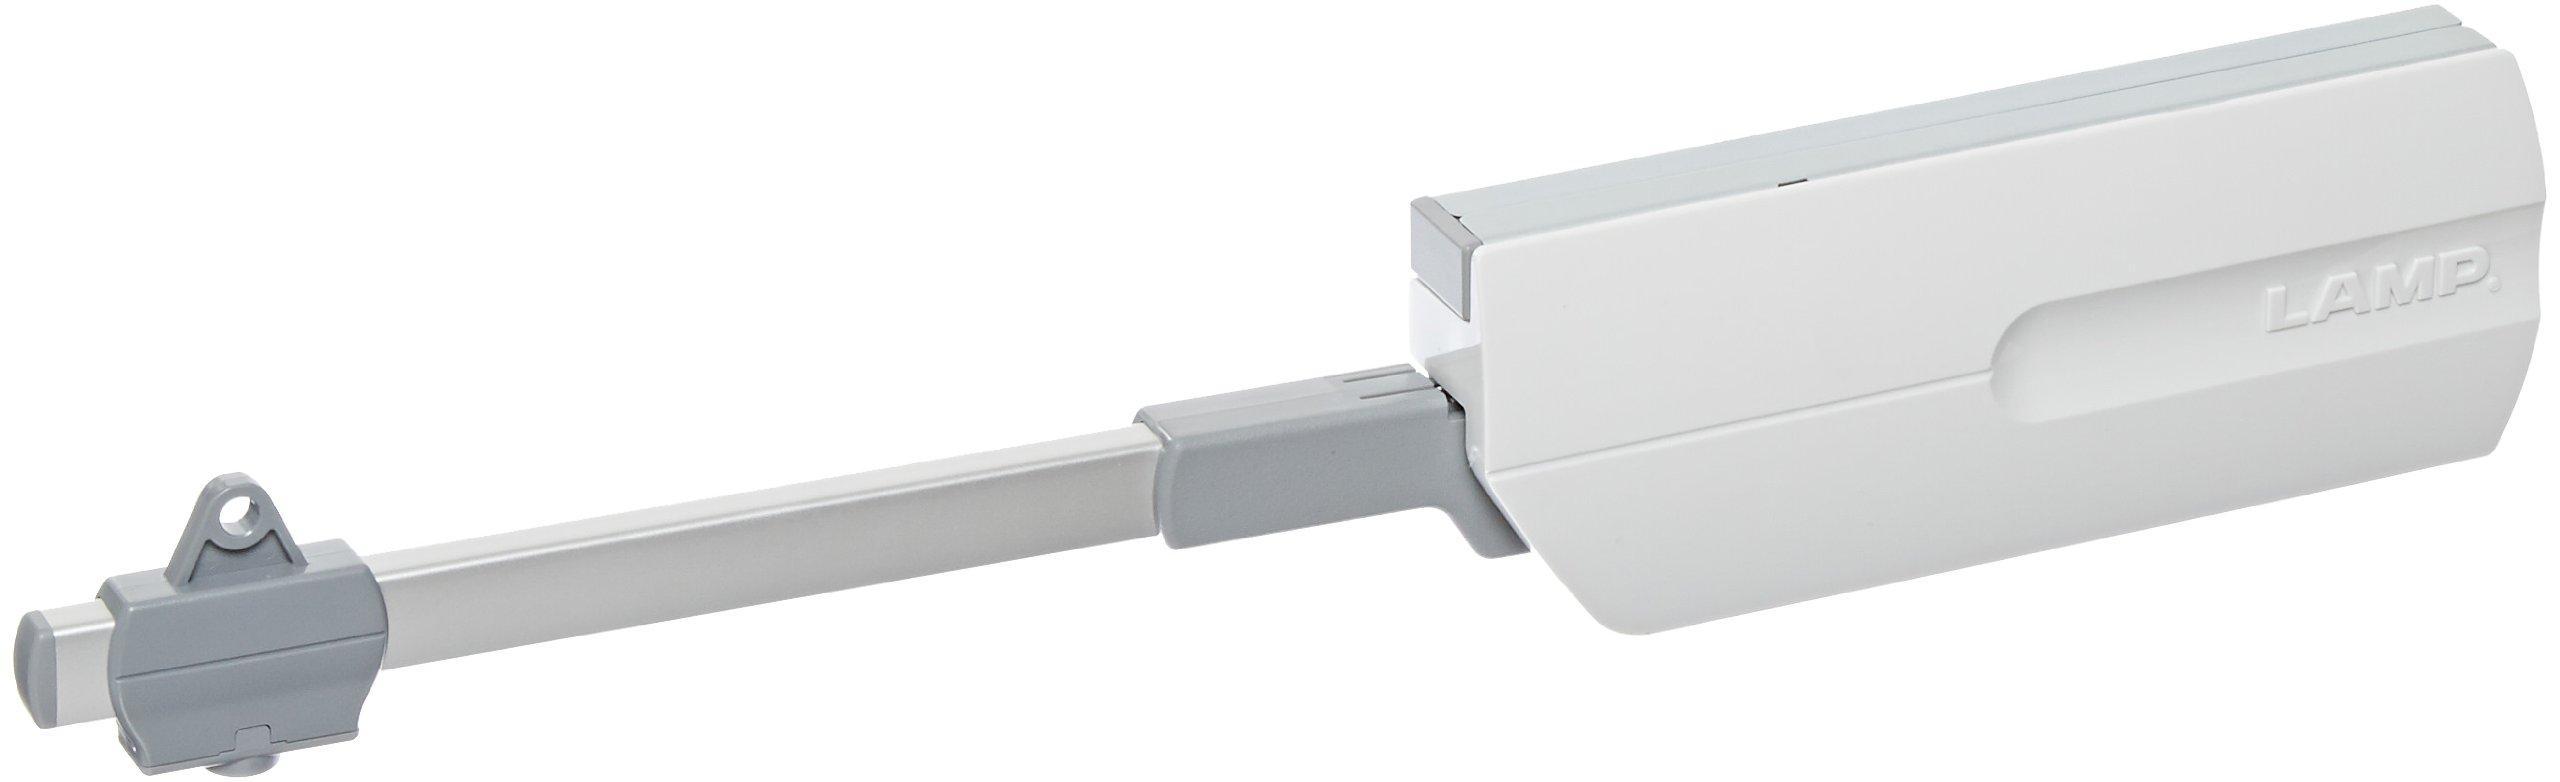 Sugatsune, Lamp SLS-ELAN-HL Lid Stays, Aluminium, Steel, ABS, Anodized,Galvanized,Light Grey